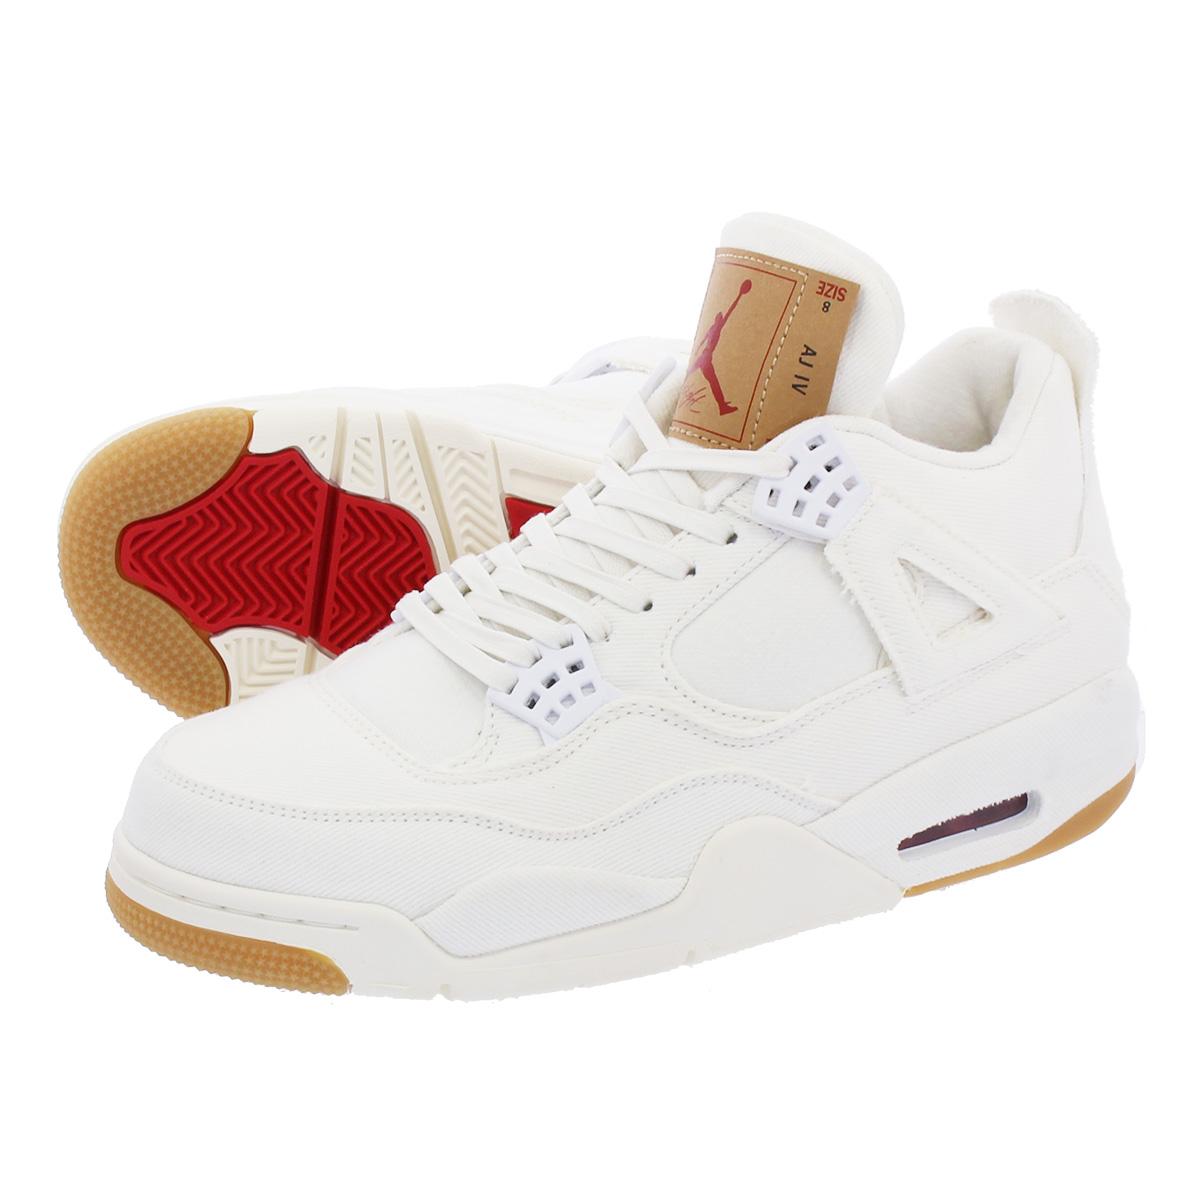 ae3a61f468e51f NIKE AIR JORDAN 4 RETRO NRG Nike air Jordan 4 nostalgic NRG Levis WHITE  WHITE ao2571-100